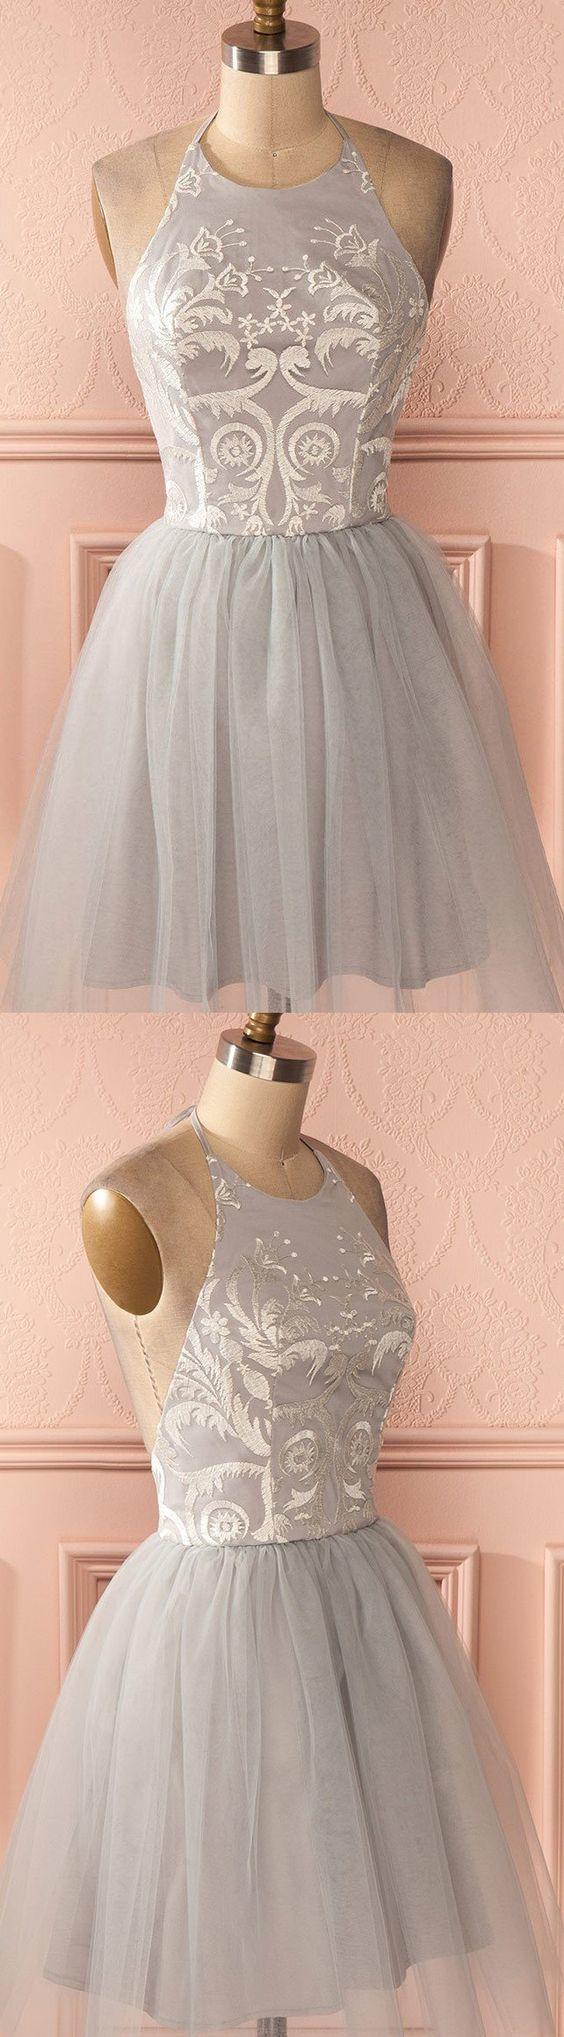 Cheap Sleeveless Silver Prom Homecoming Dresses Distinct Short A-line/Princess